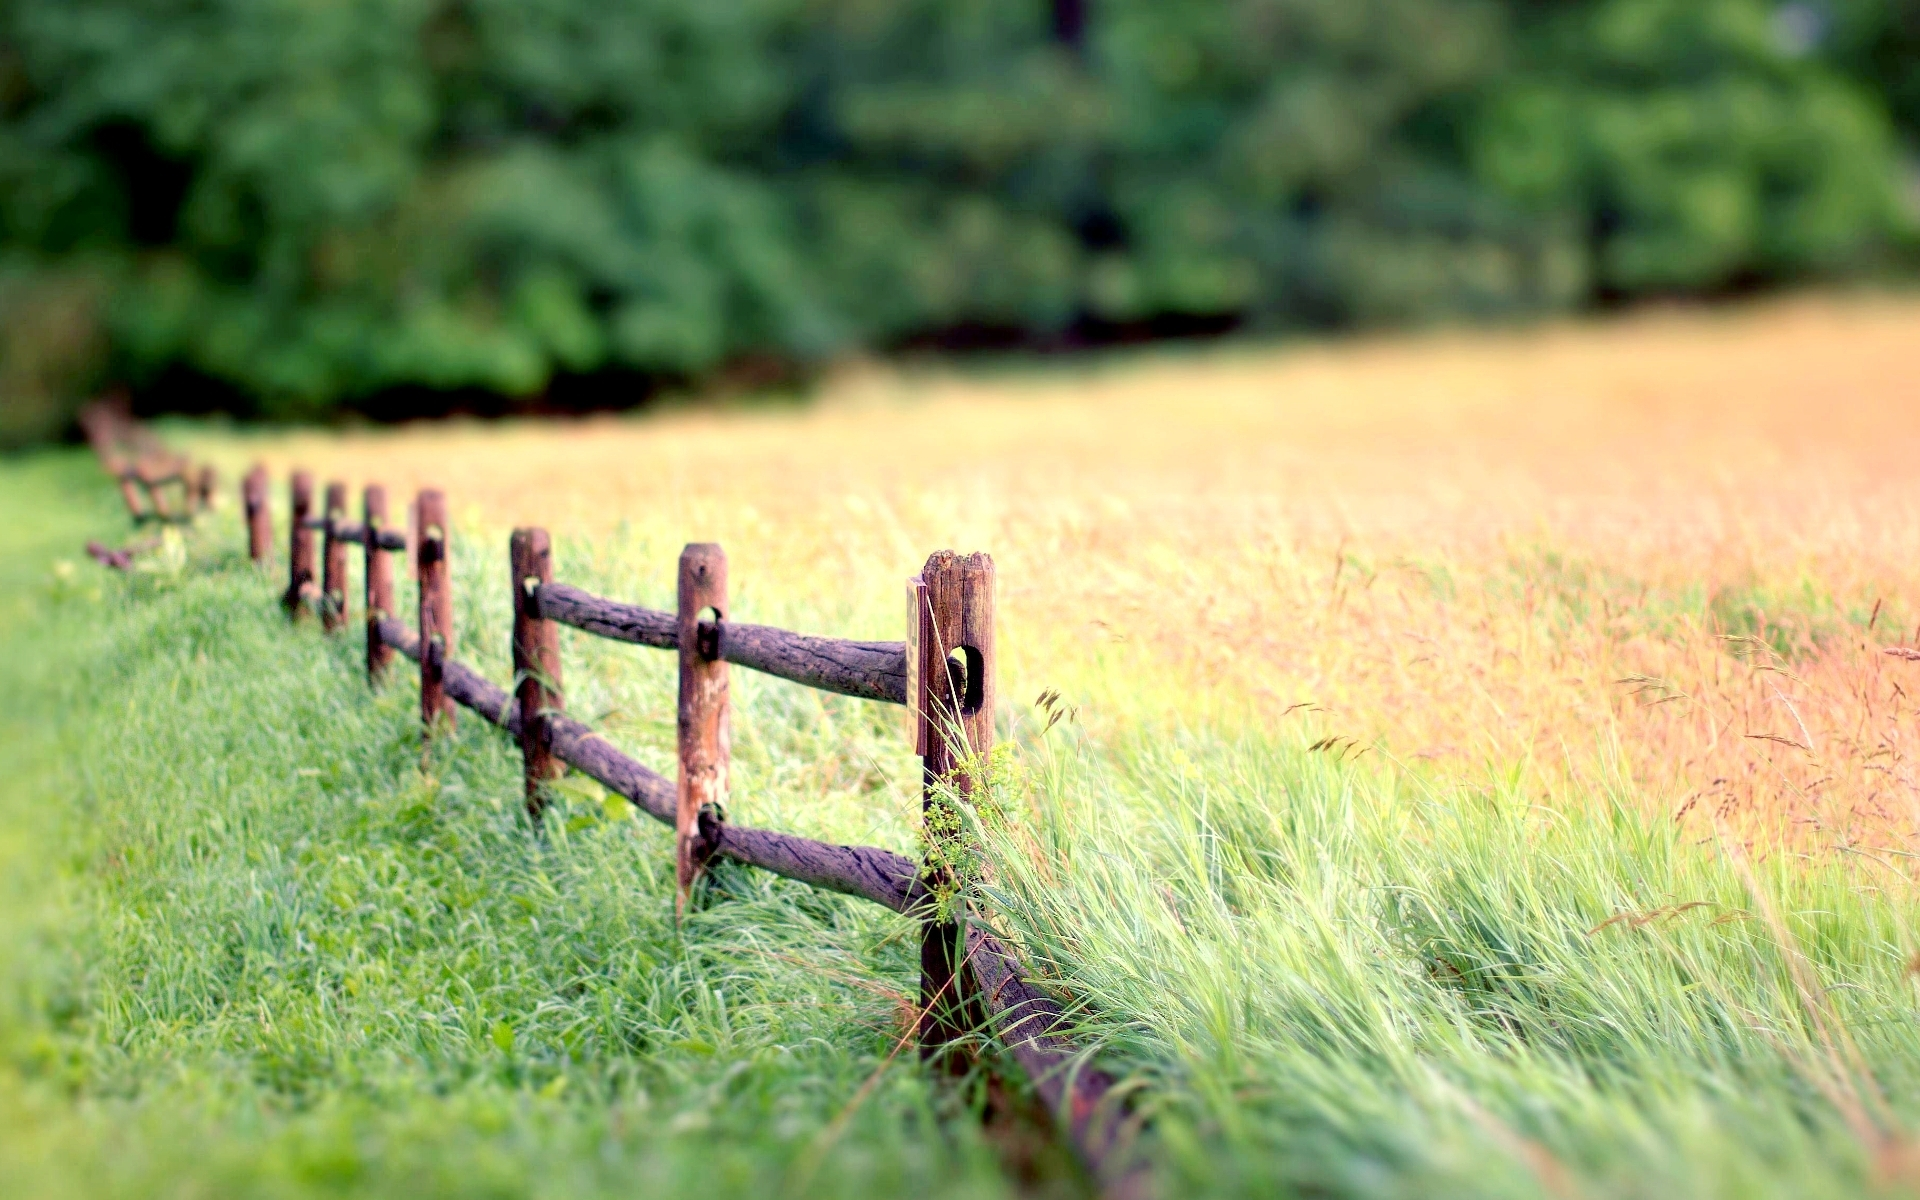 природа восход забор трава фокус бесплатно